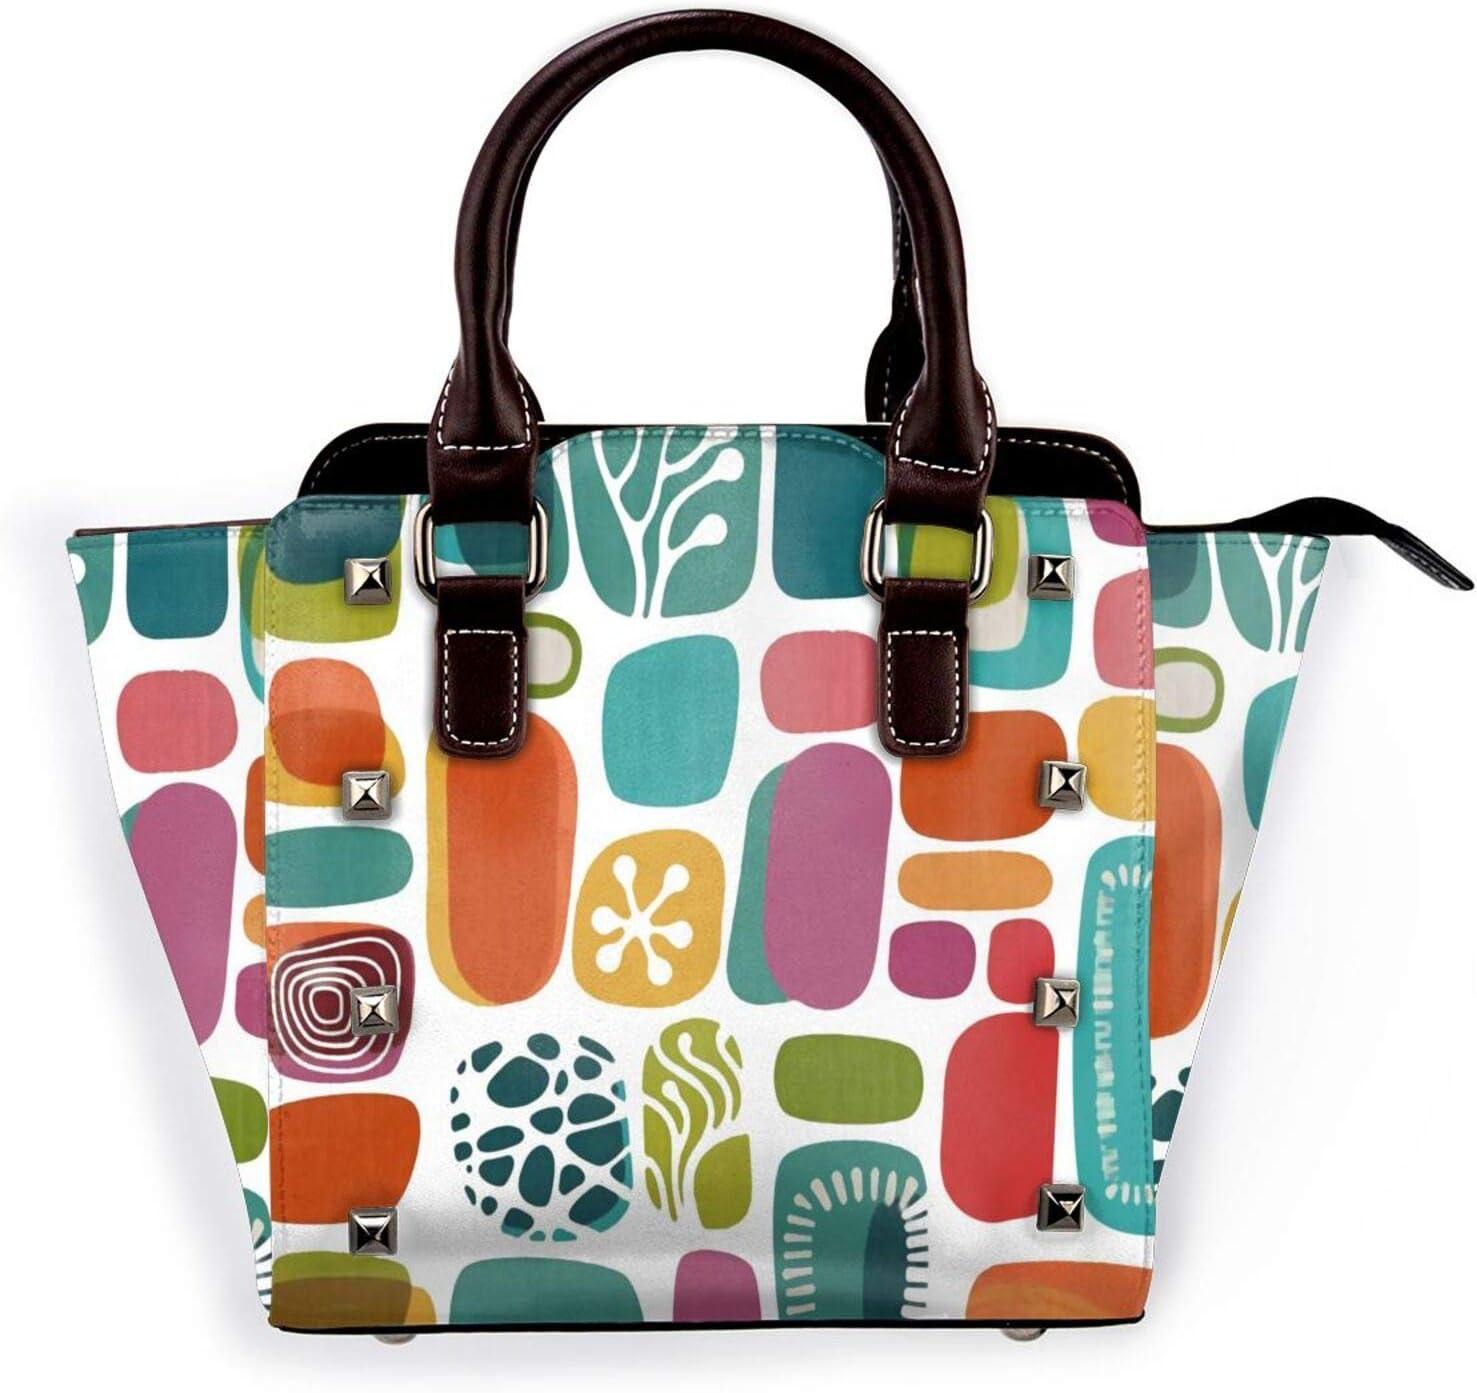 Tote Bag Geometric Modern Style Handbags Ba Space Large Same Austin Mall day shipping Shoulder